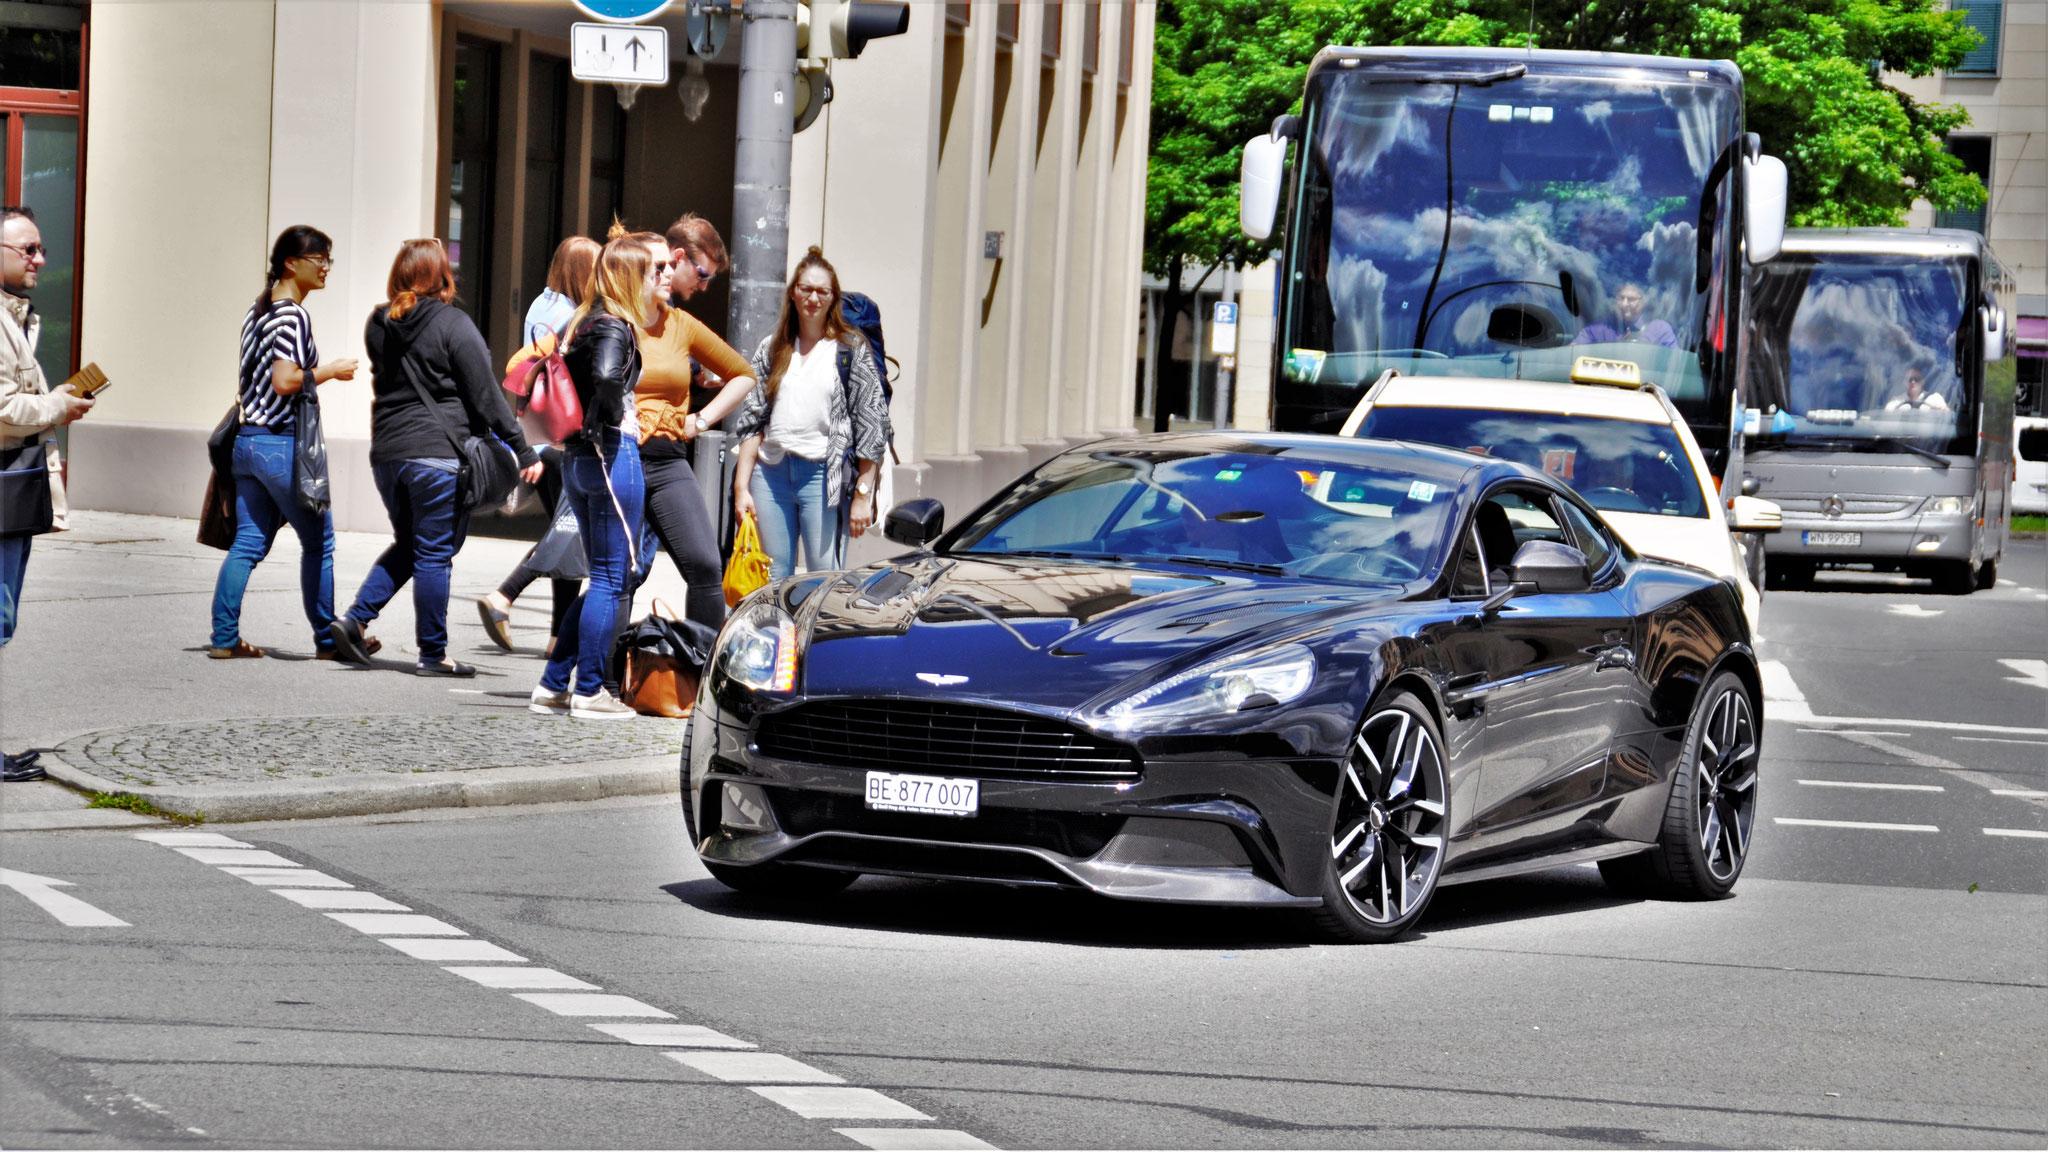 Aston Martin Vanquish - BE-877007 (CH)